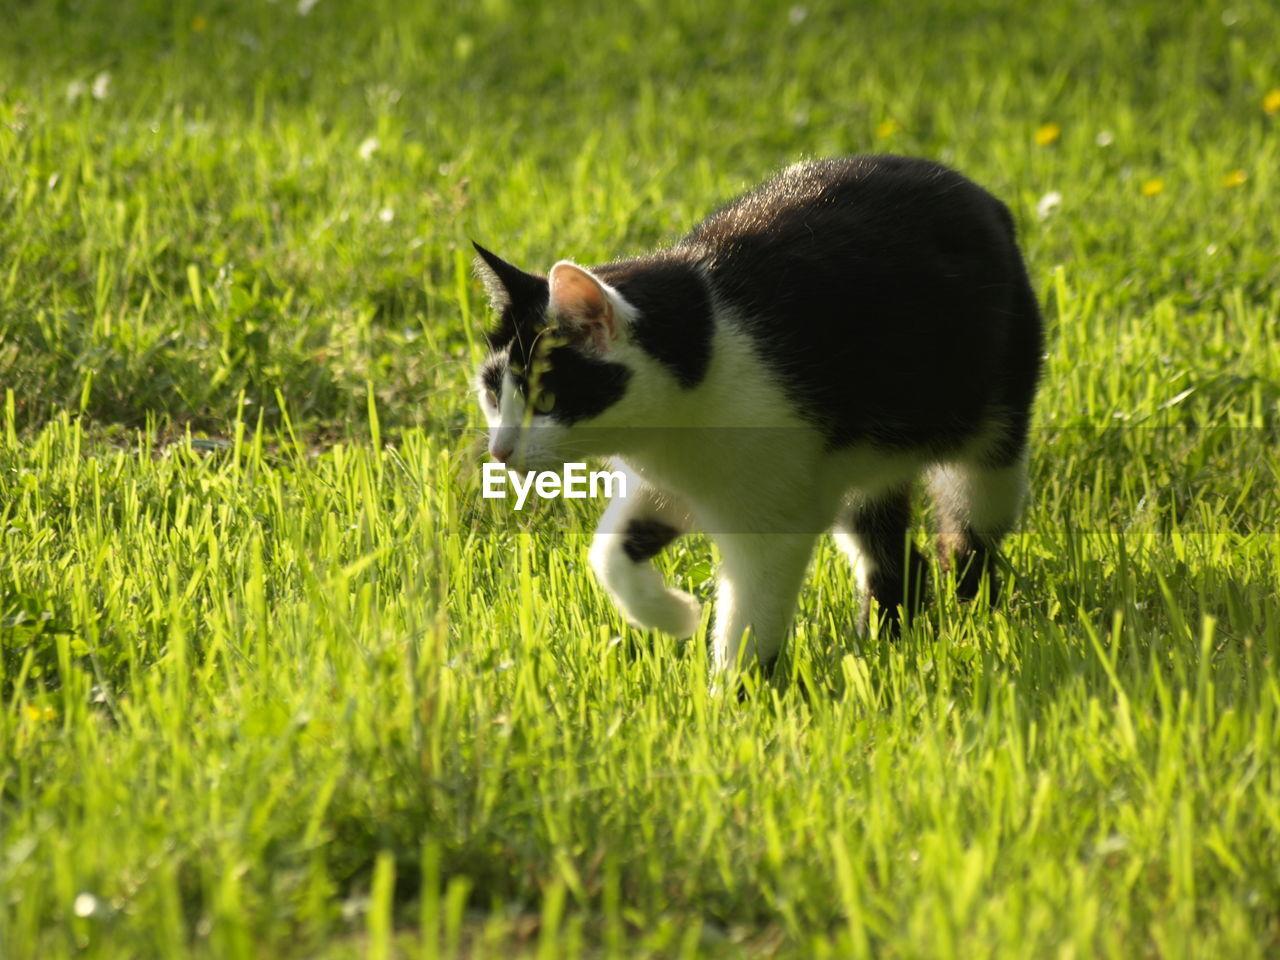 Close-Up Of A Cat On Grassland